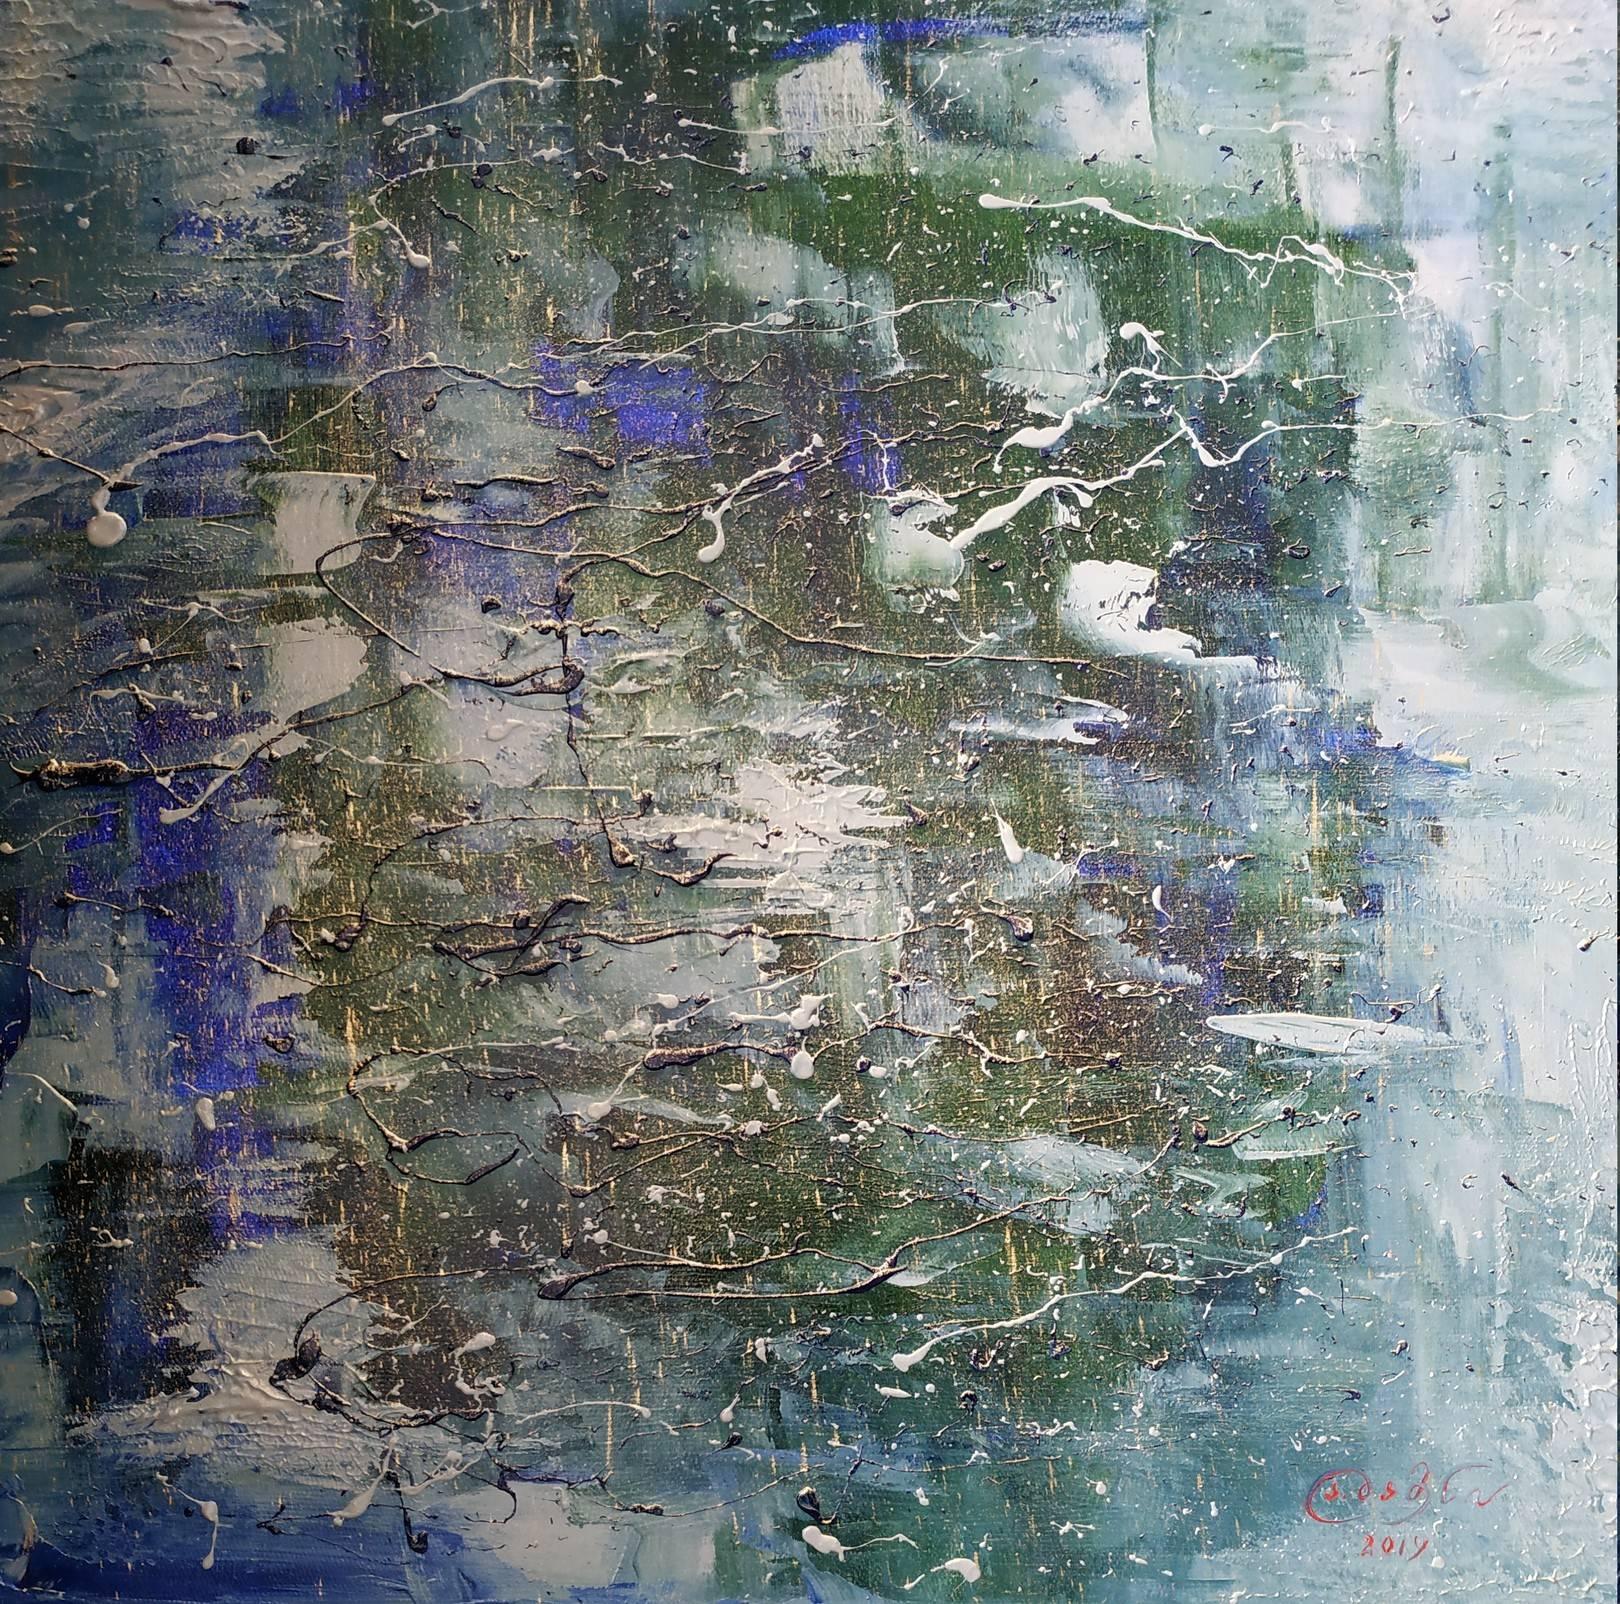 «Облака, отражённые в вечернем озере» холст, масло «The clouds reflected in the evening lake»  oil on canvas  50x50,  2019